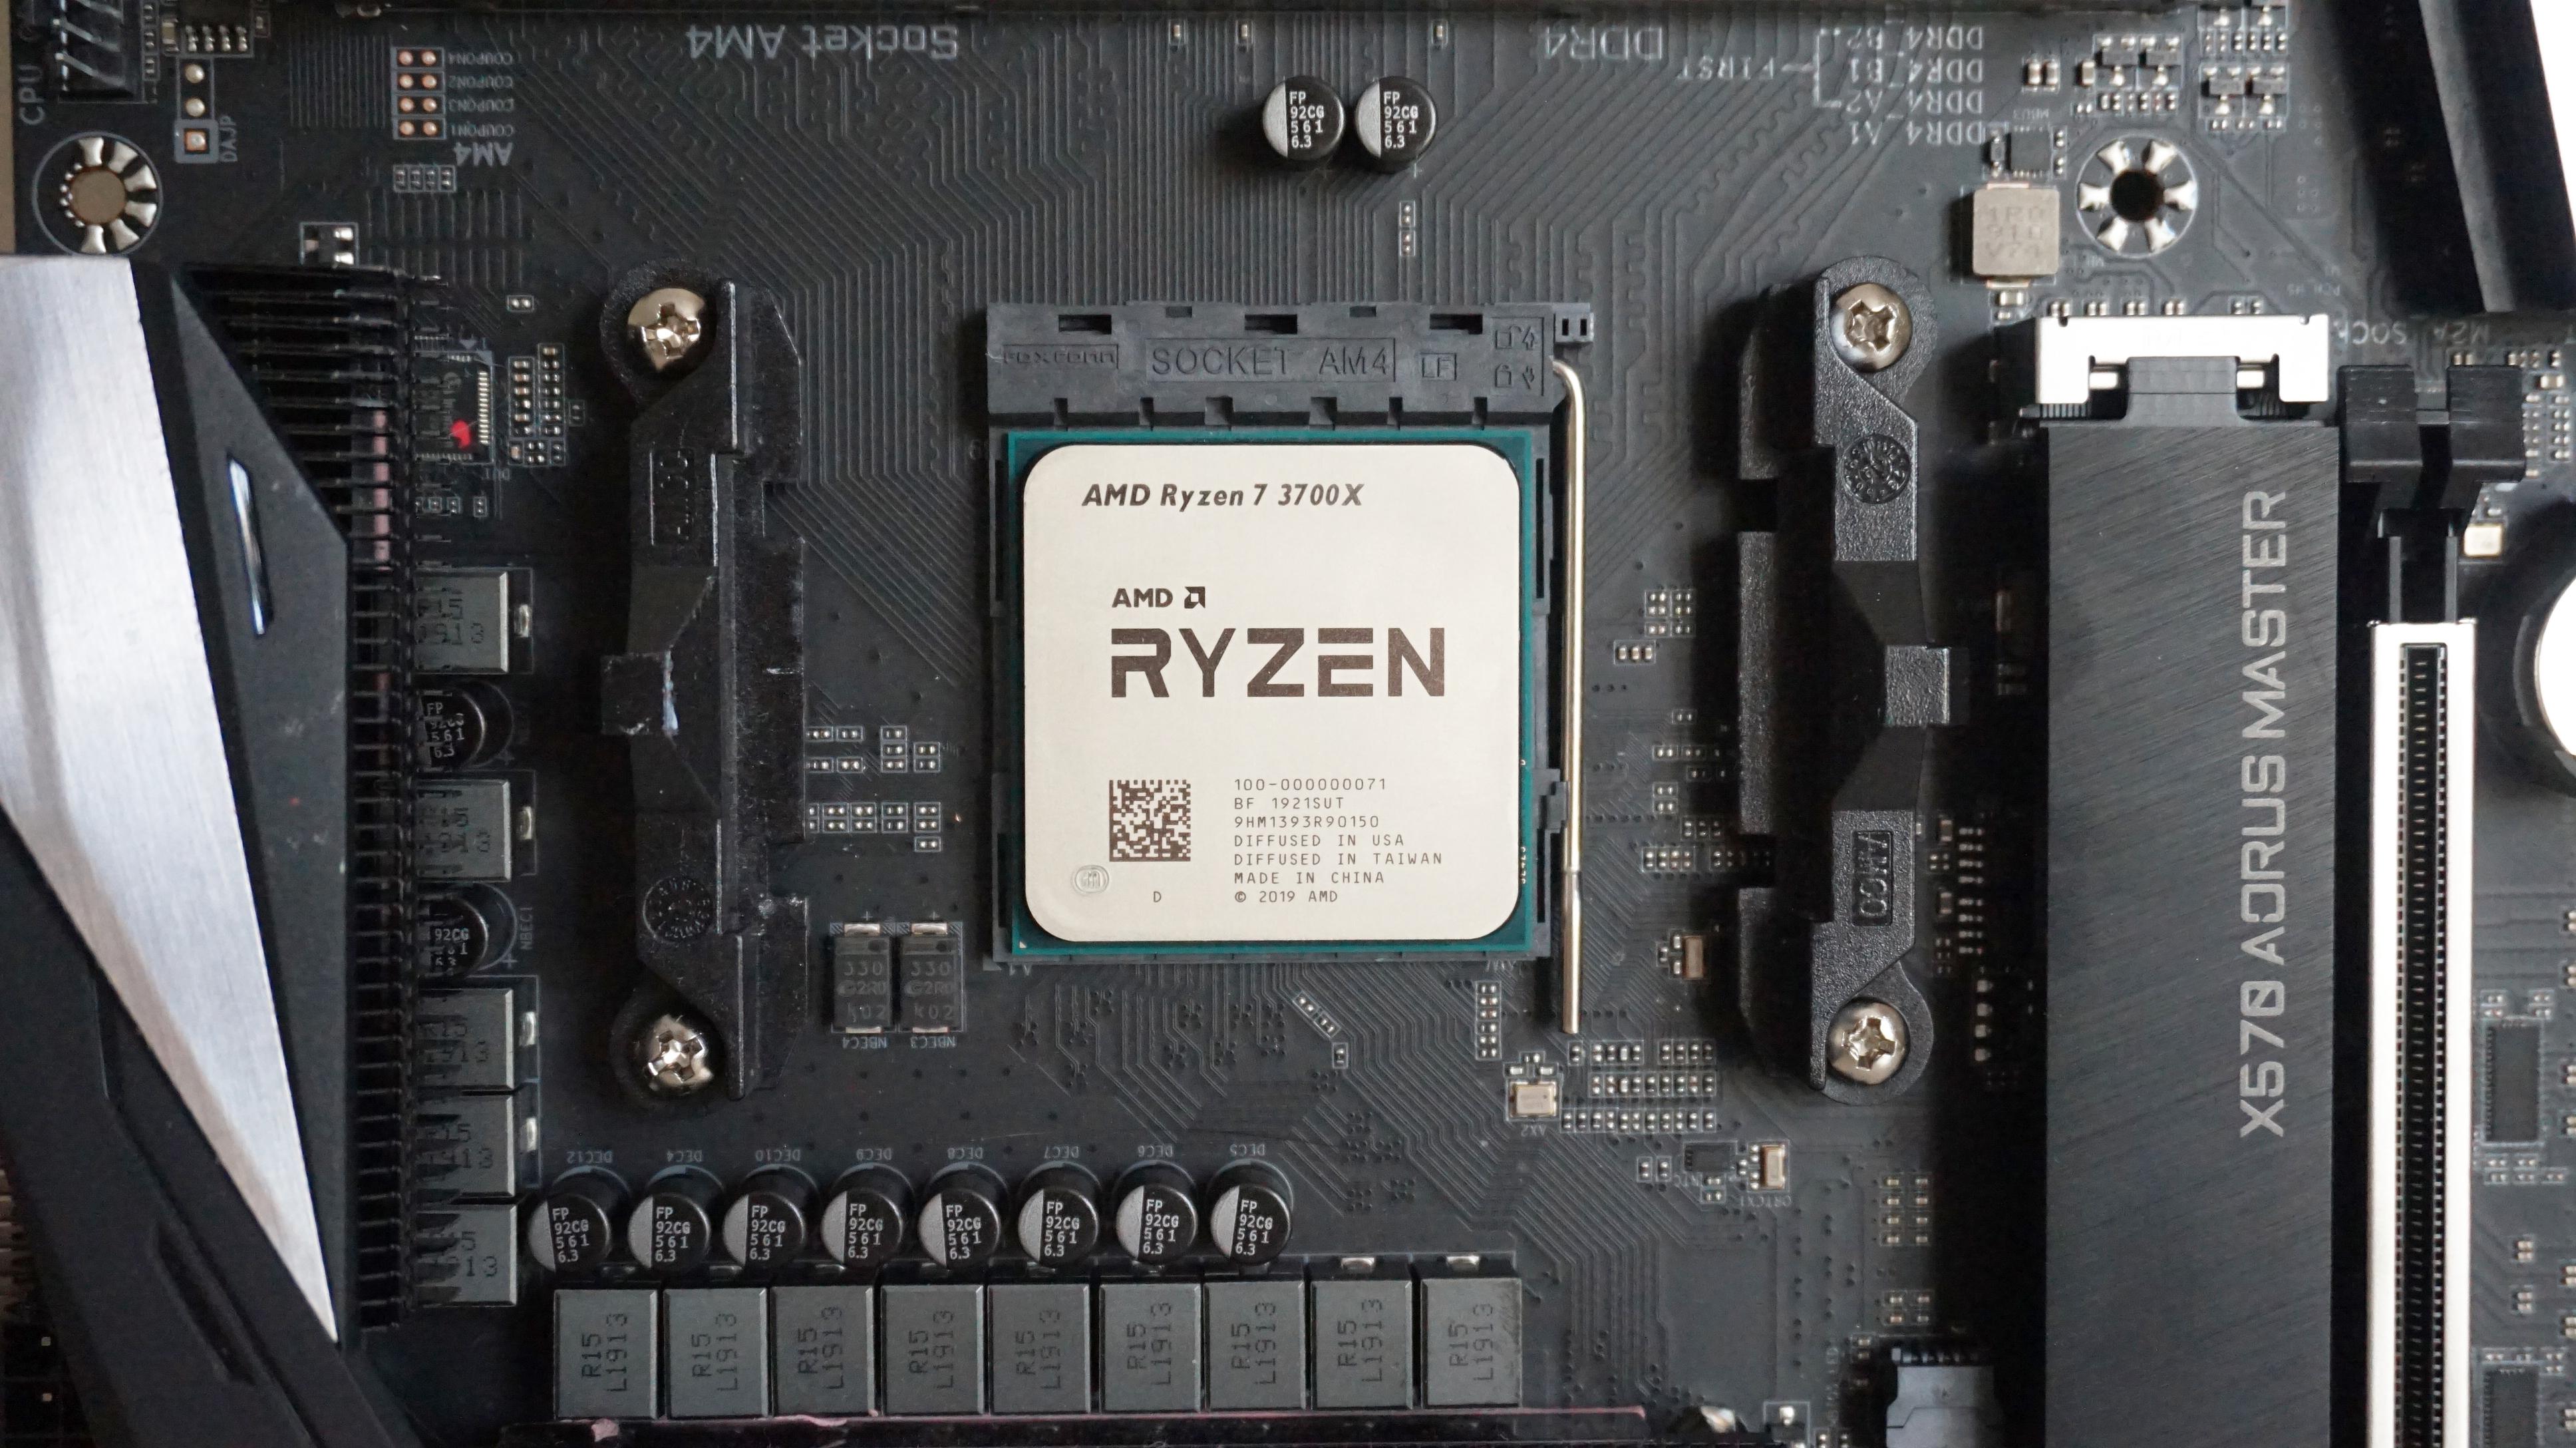 AMD Ryzen 7 3700X review: A Core i7 killer?   Rock Paper Shotgun